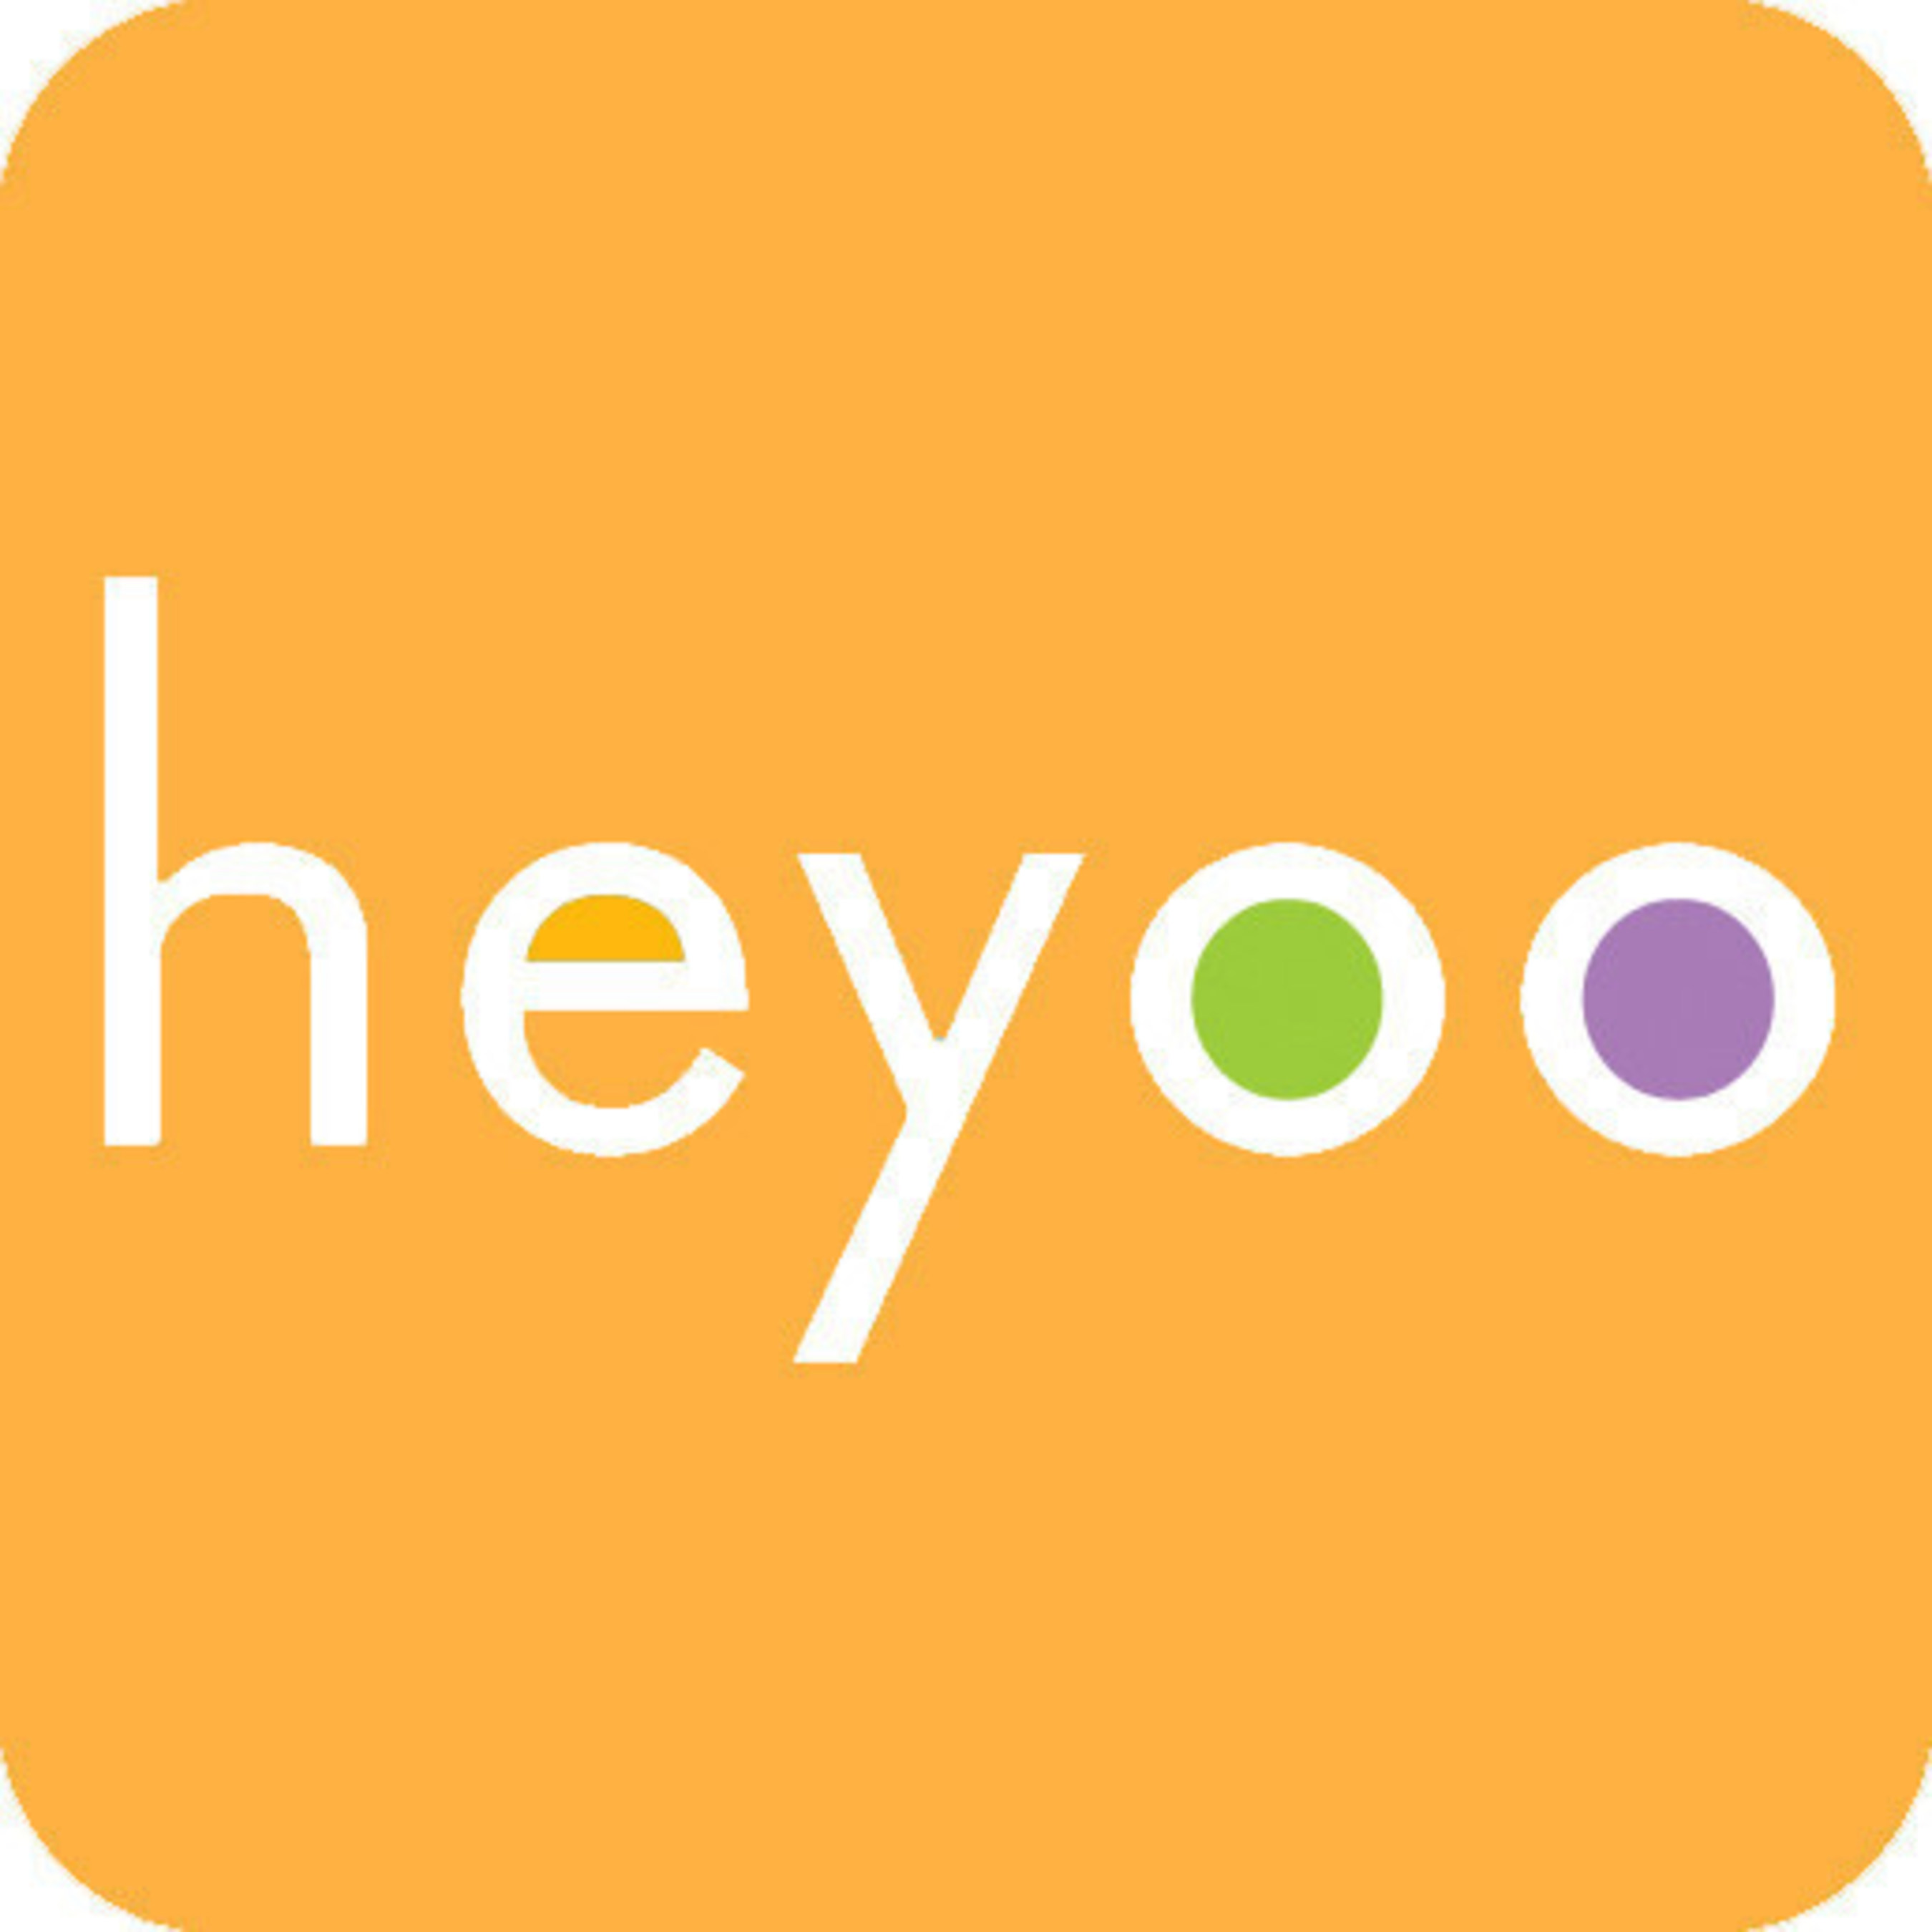 Heyoo™ - Revolutionizing the Concept of Calendaring